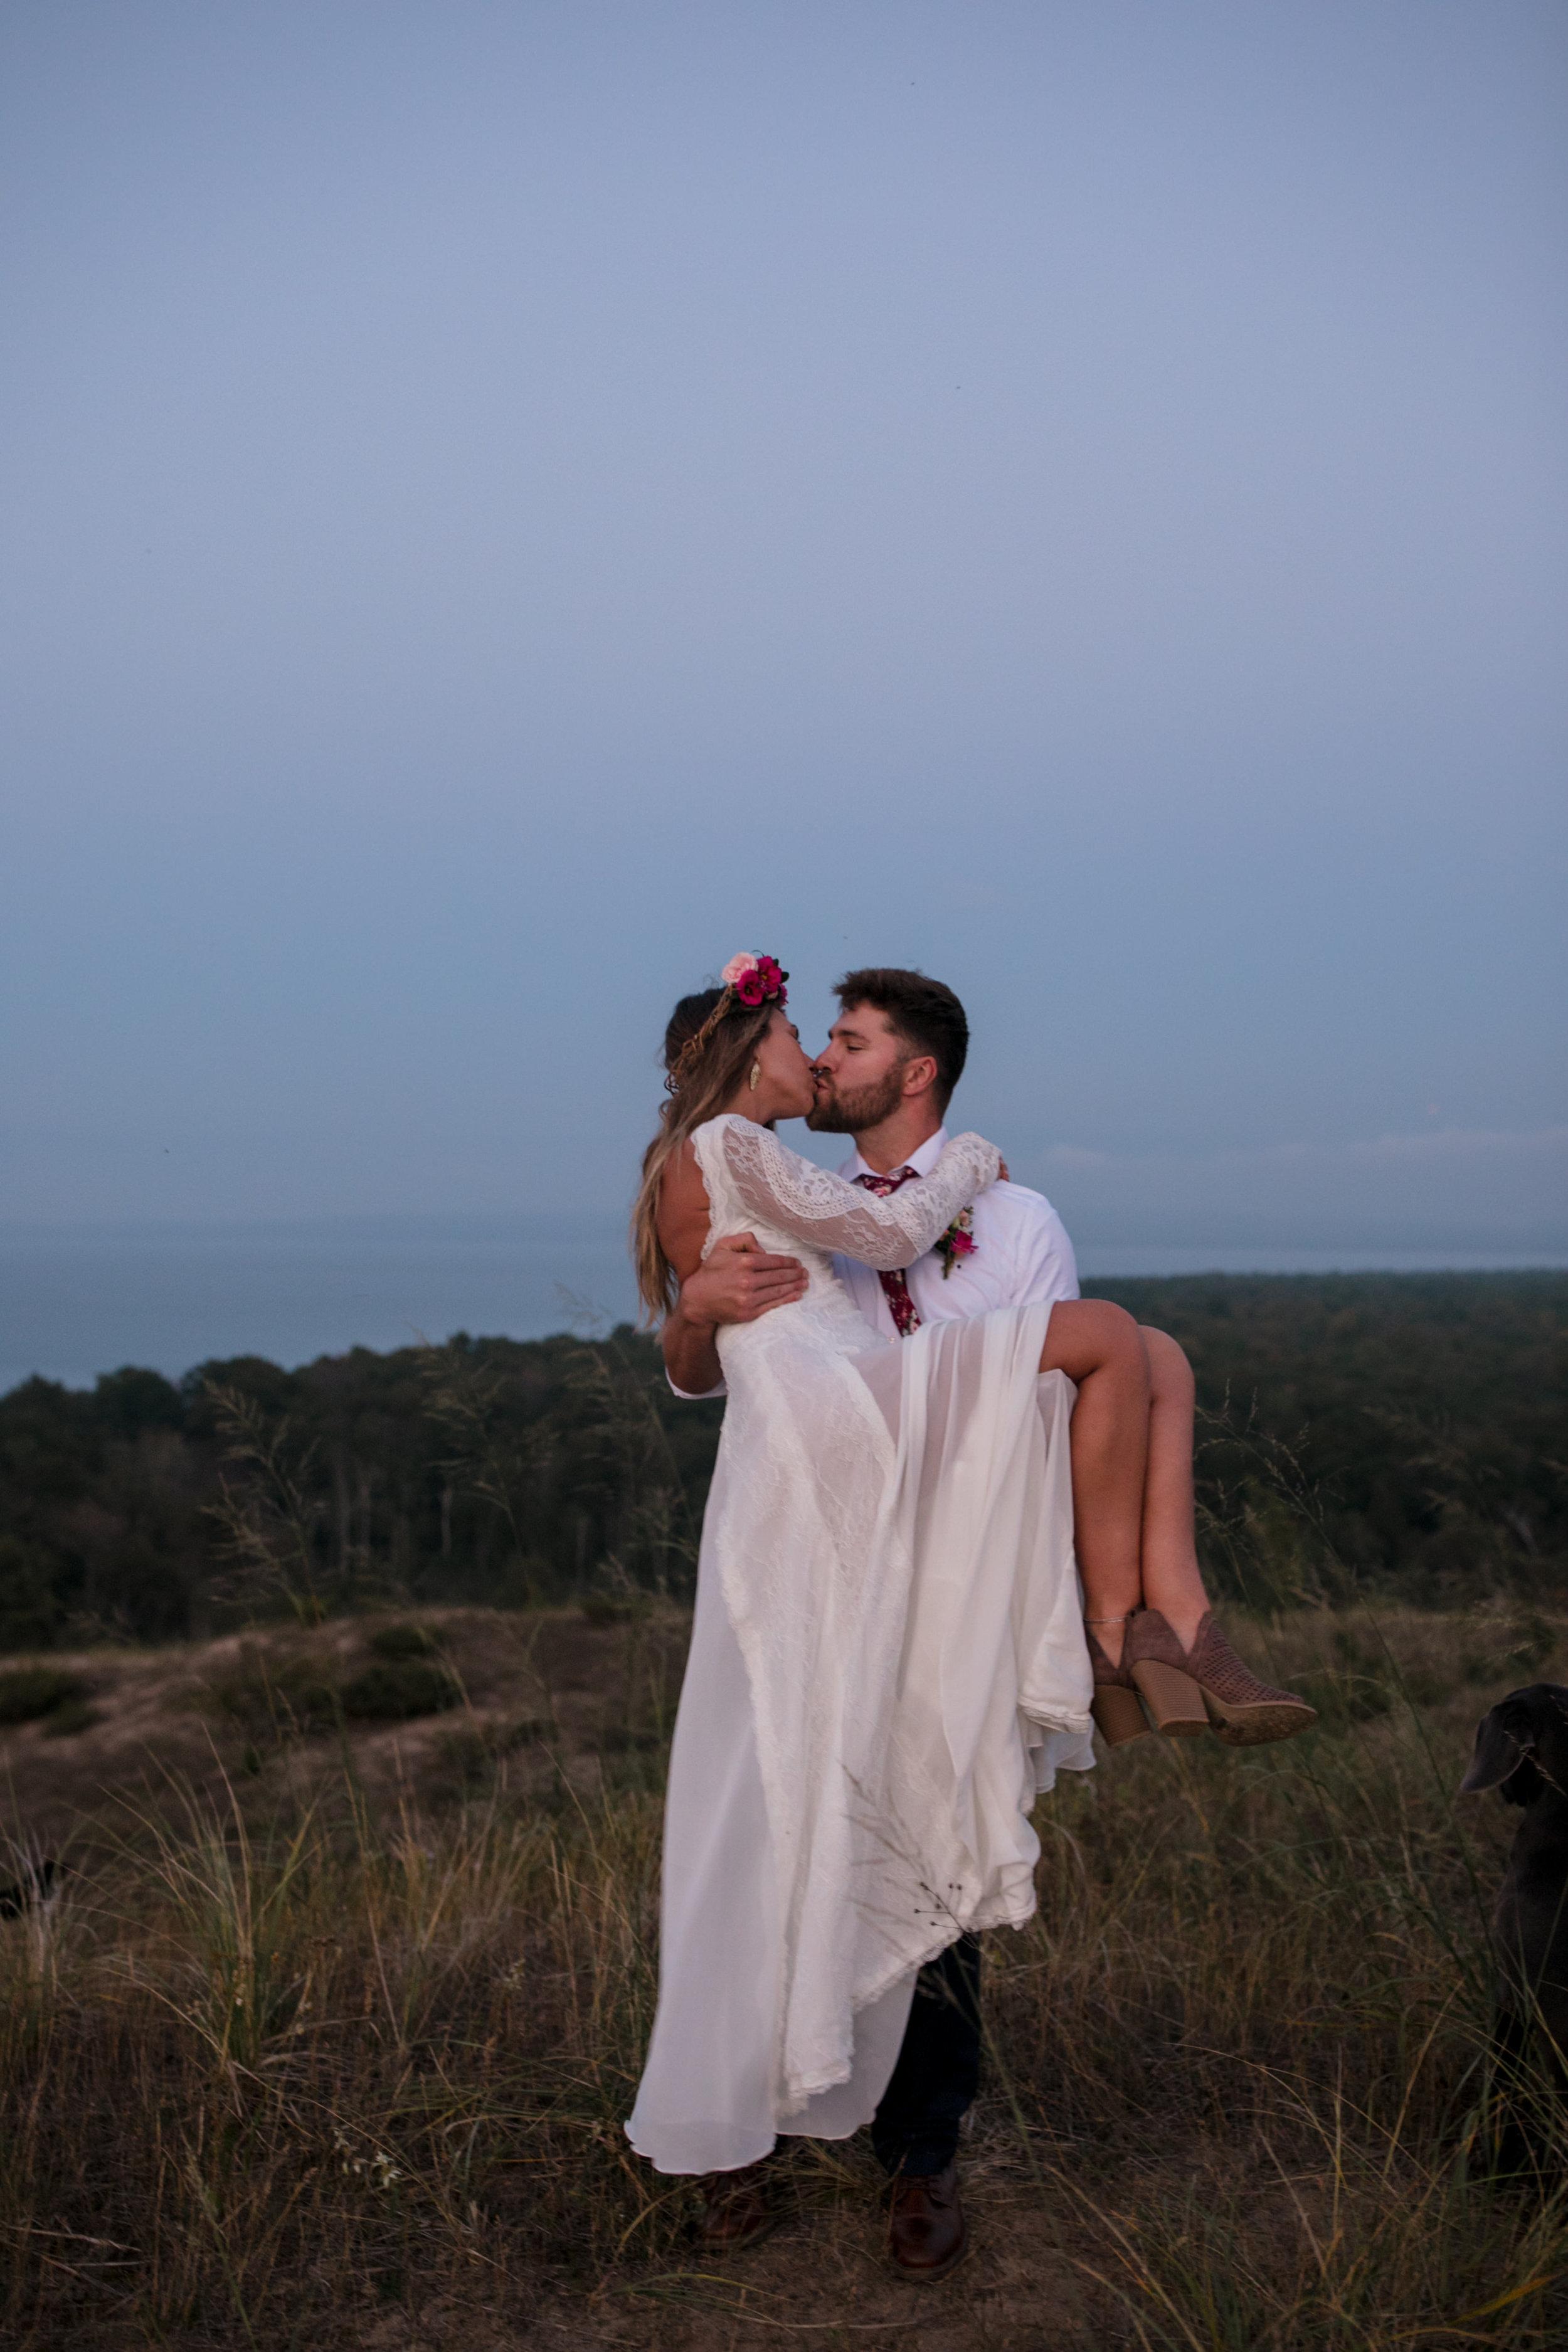 michigan-emotive-photographer-moonlight-elopement-mariha-hunter-230.jpg